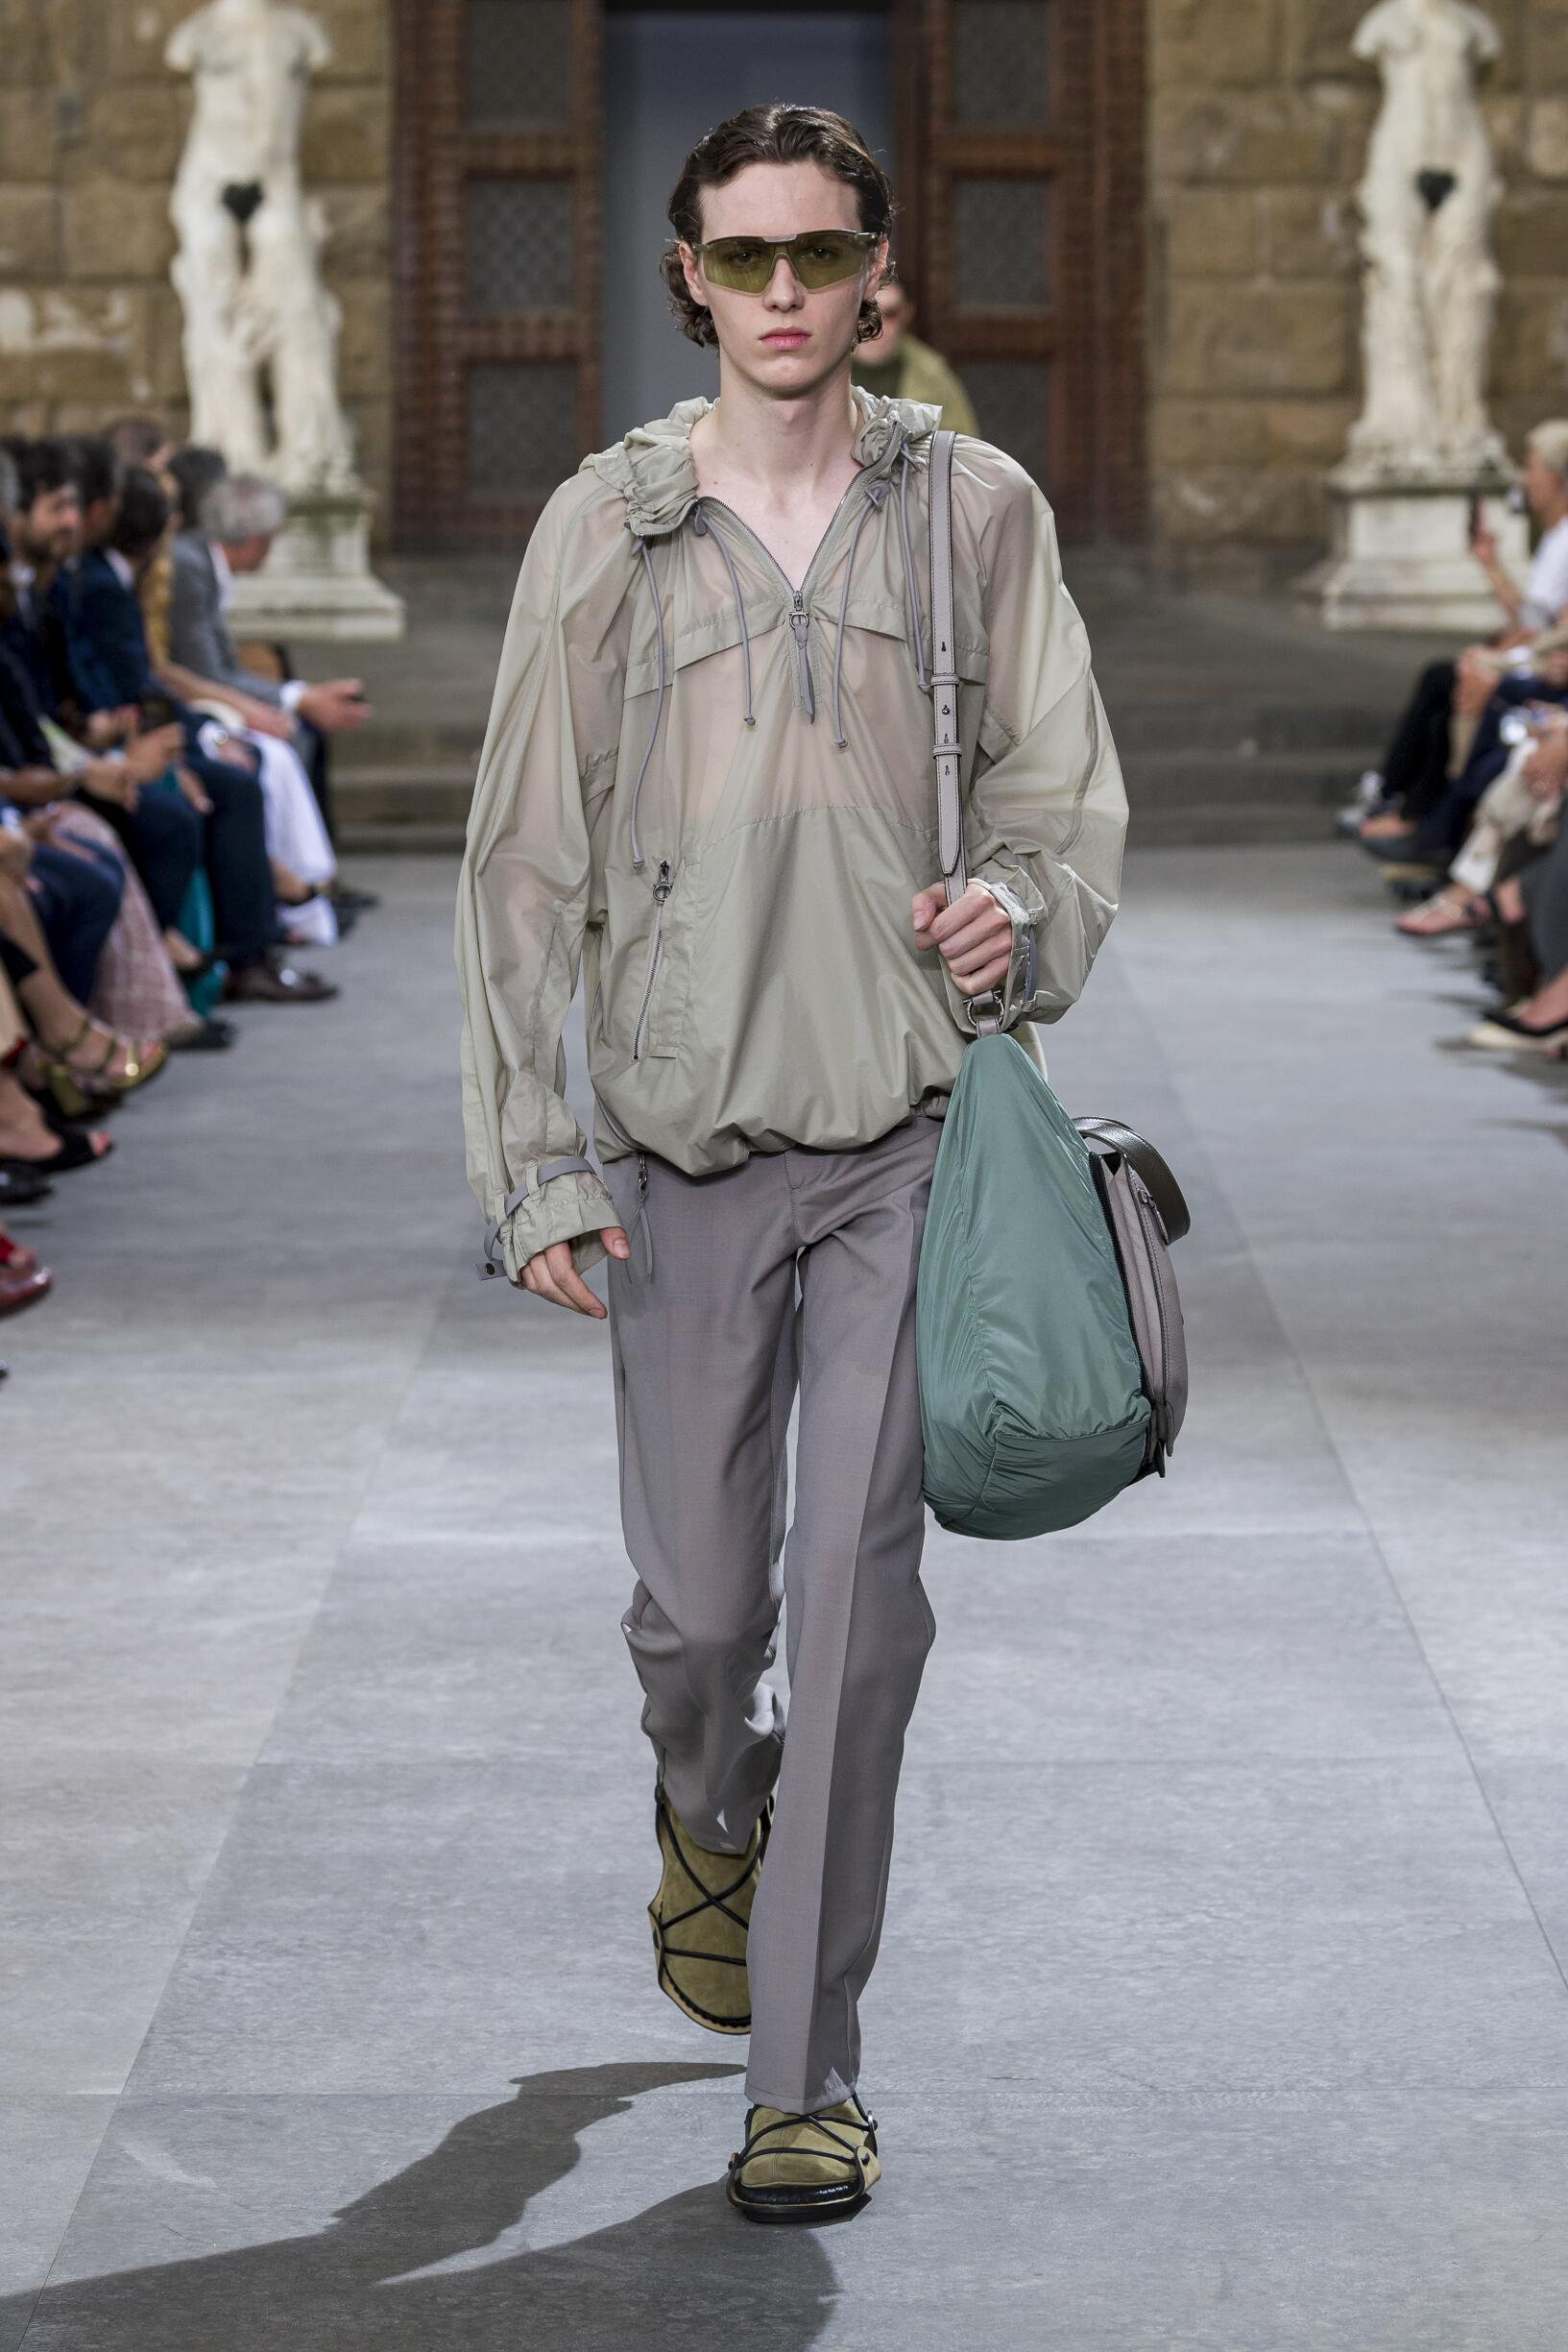 Fashion Man Model Salvatore Ferragamo Catwalk